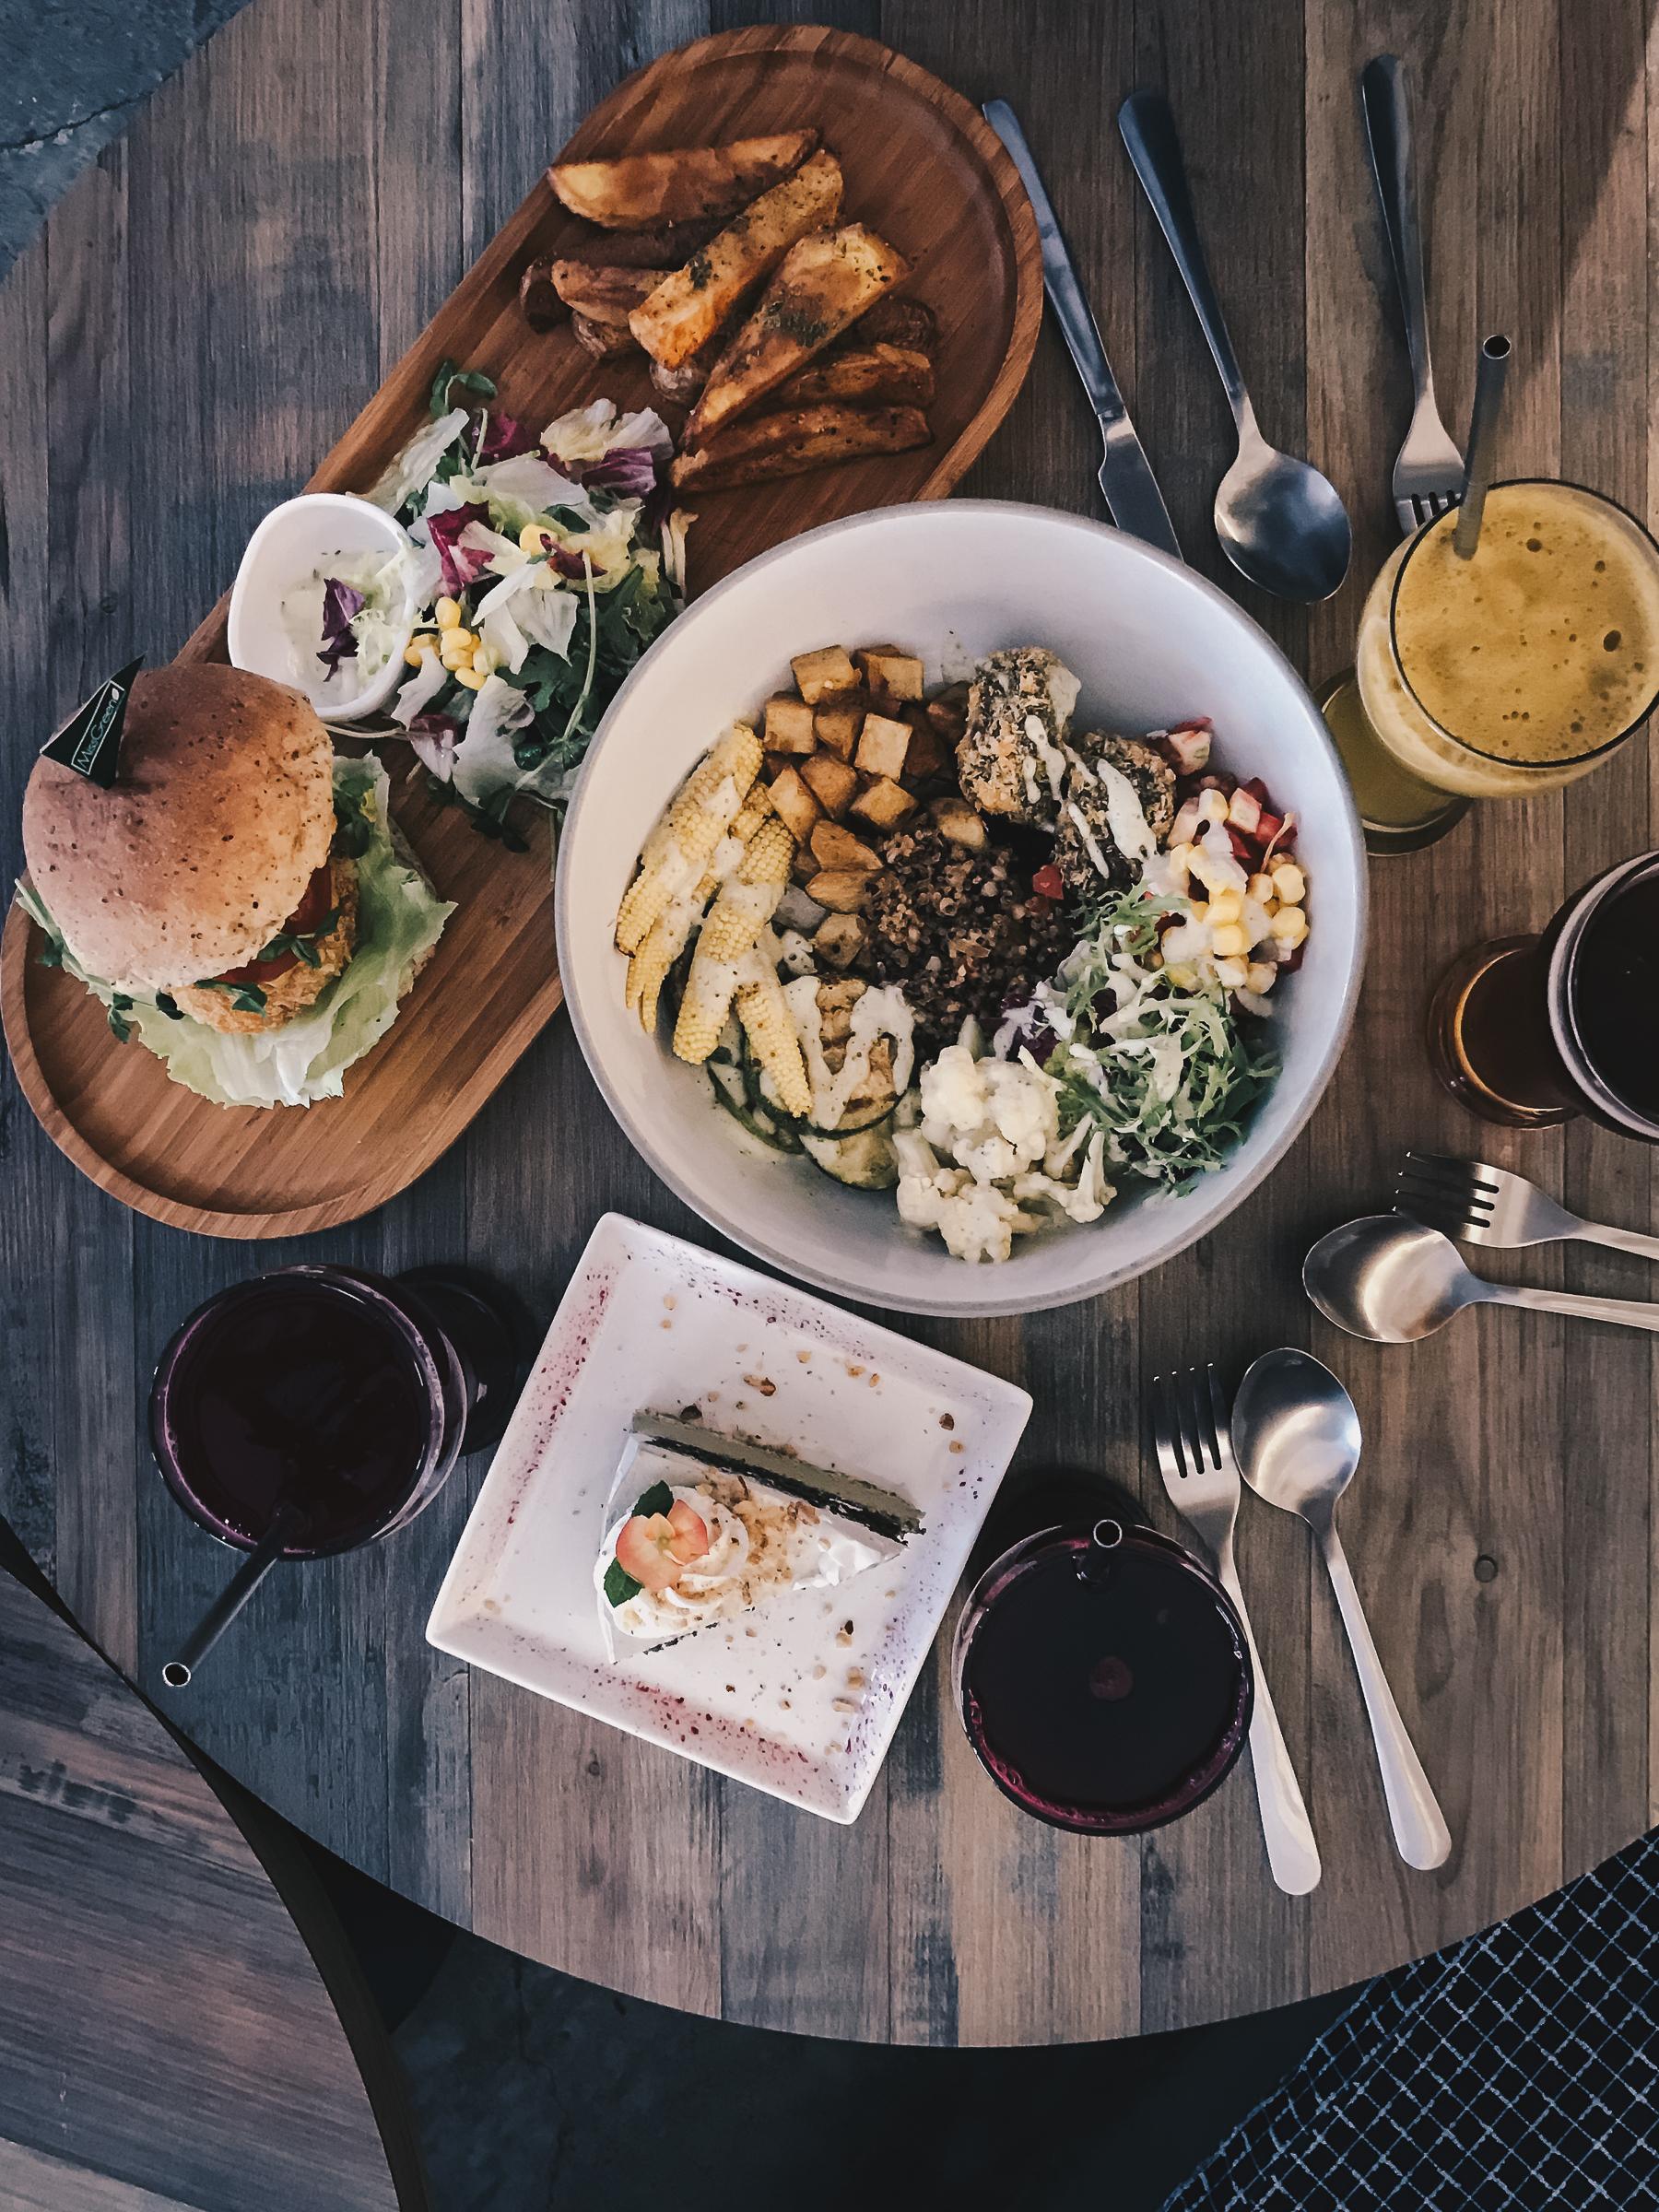 GreenPower Protein 綠色能量沙拉/ Falafel Favorite 中東香料漢堡